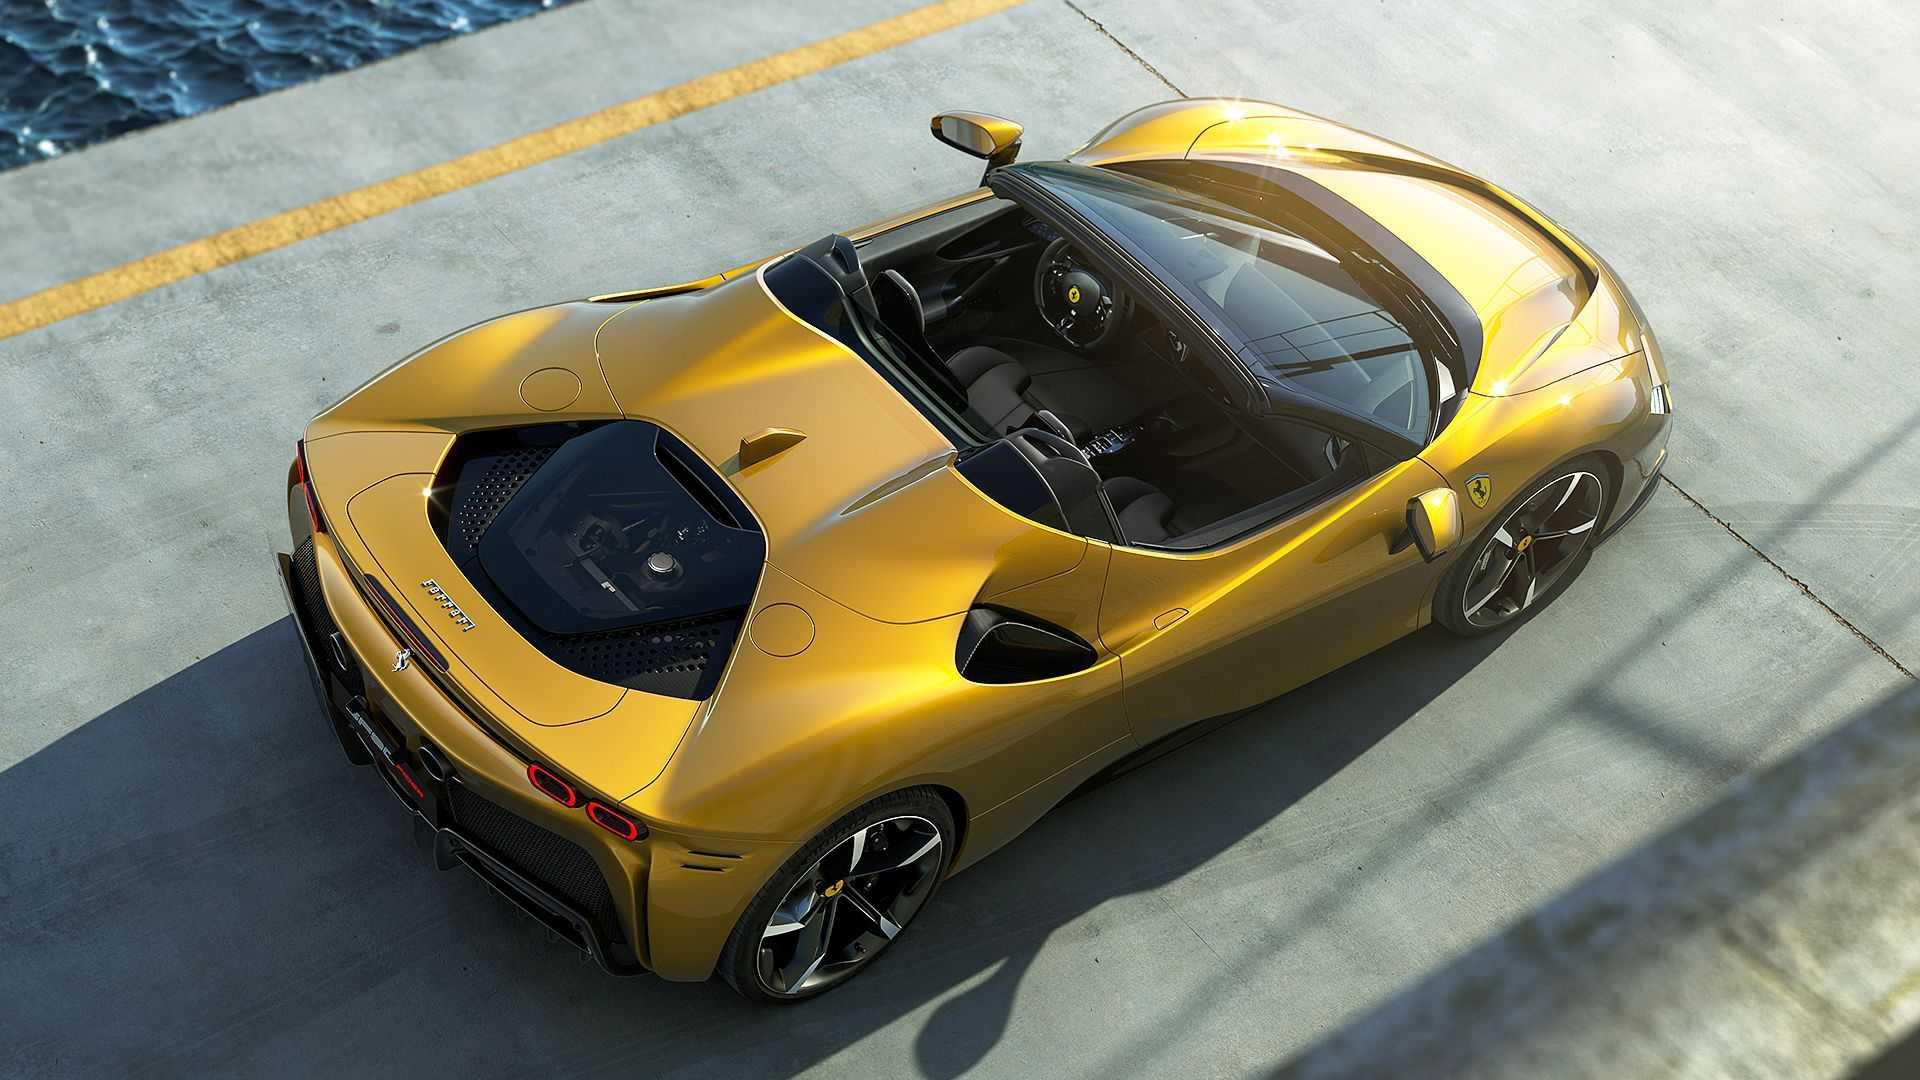 Predstavljen je hibridni Ferrari SF90 Stradale Spider